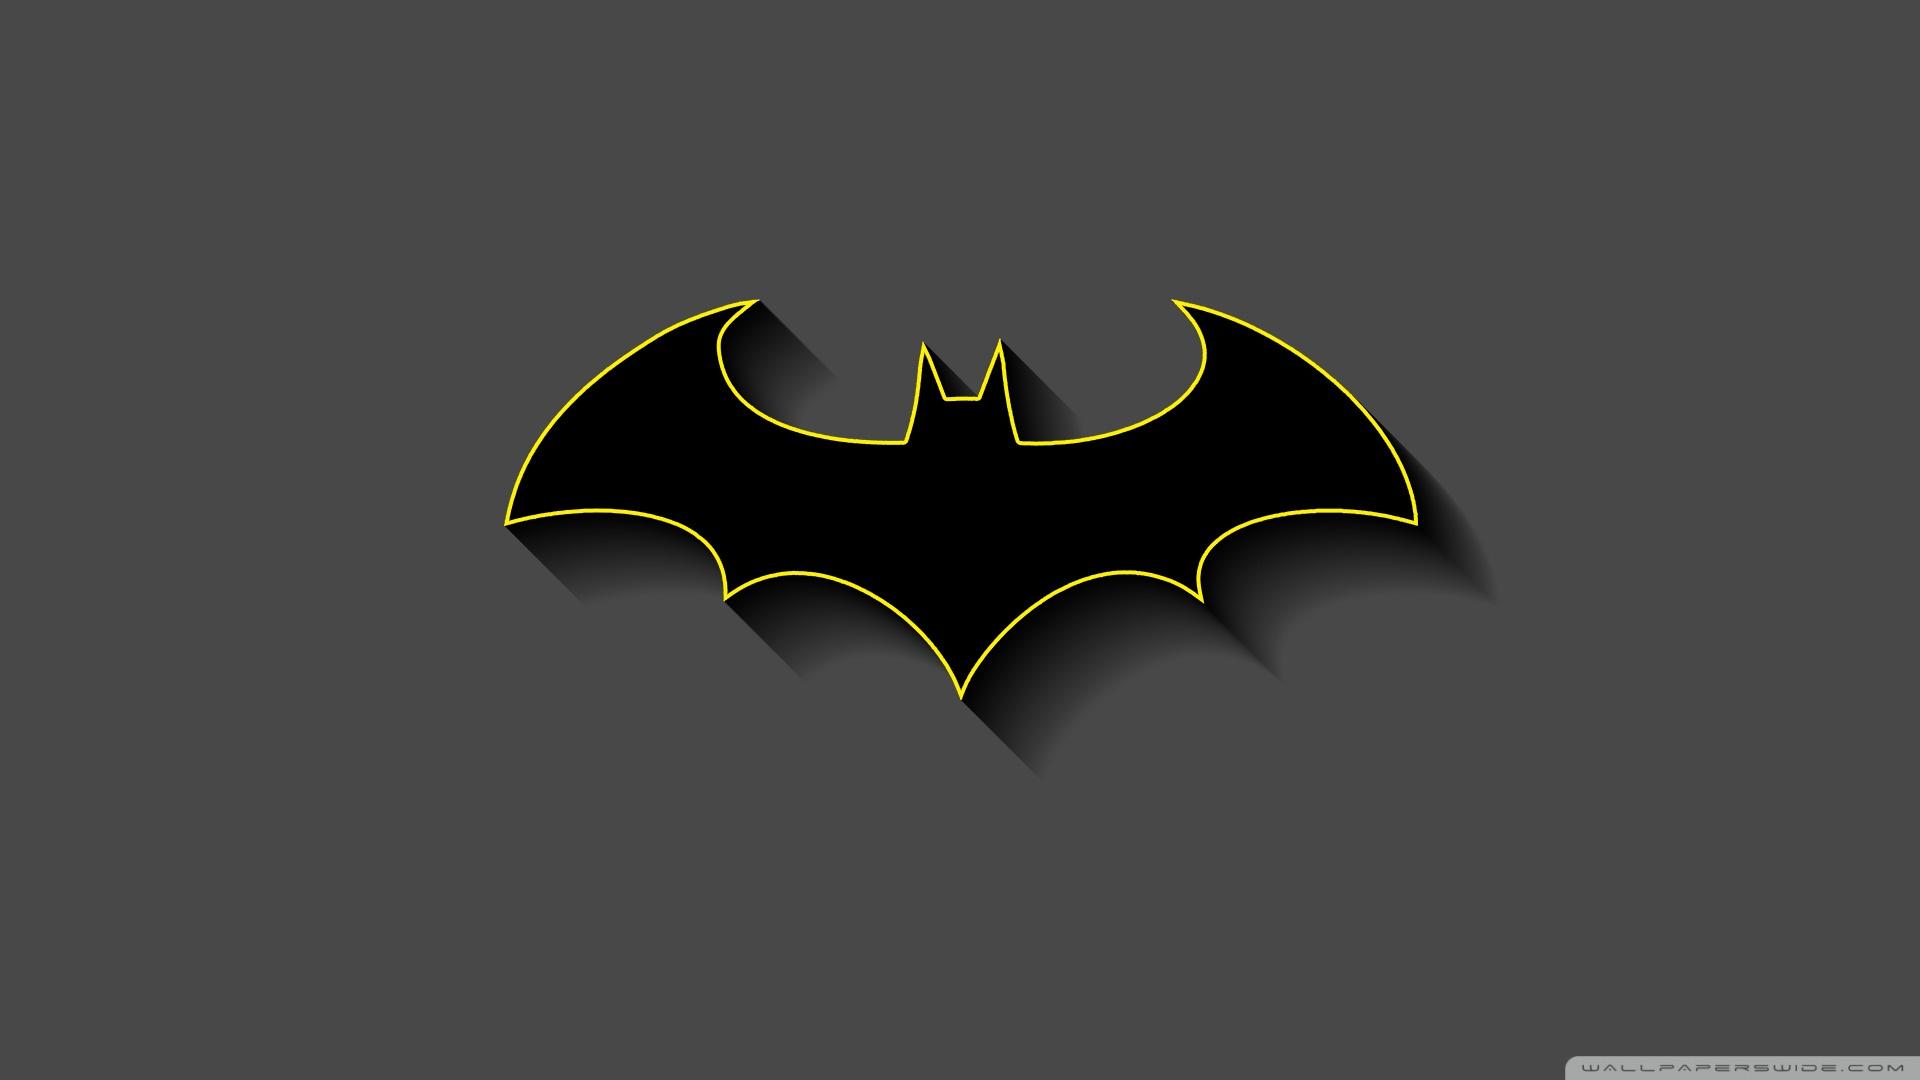 Batman Minimalist Uhd Desktop Wallpaper For 4k Ultra Hd Tv